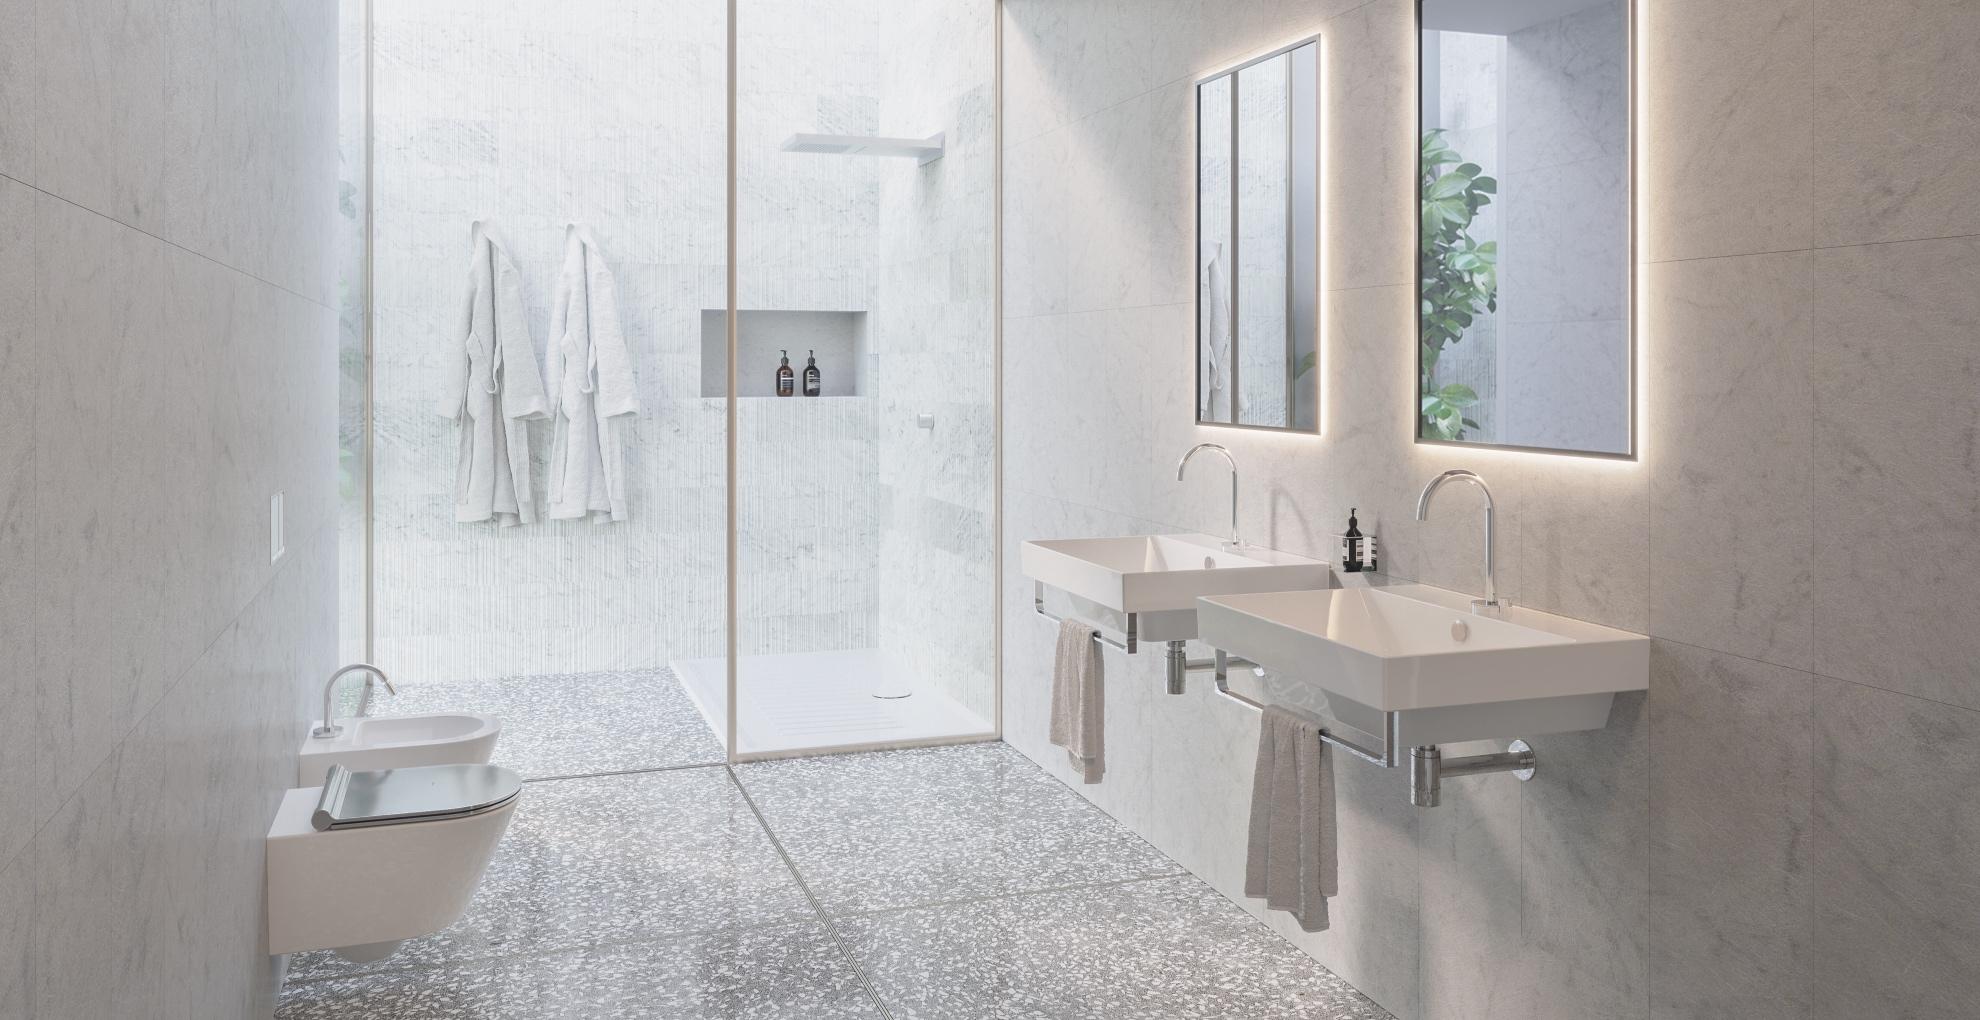 Catalano Zero 60x50 vask toilet NF Newflush wc bidet 55x35